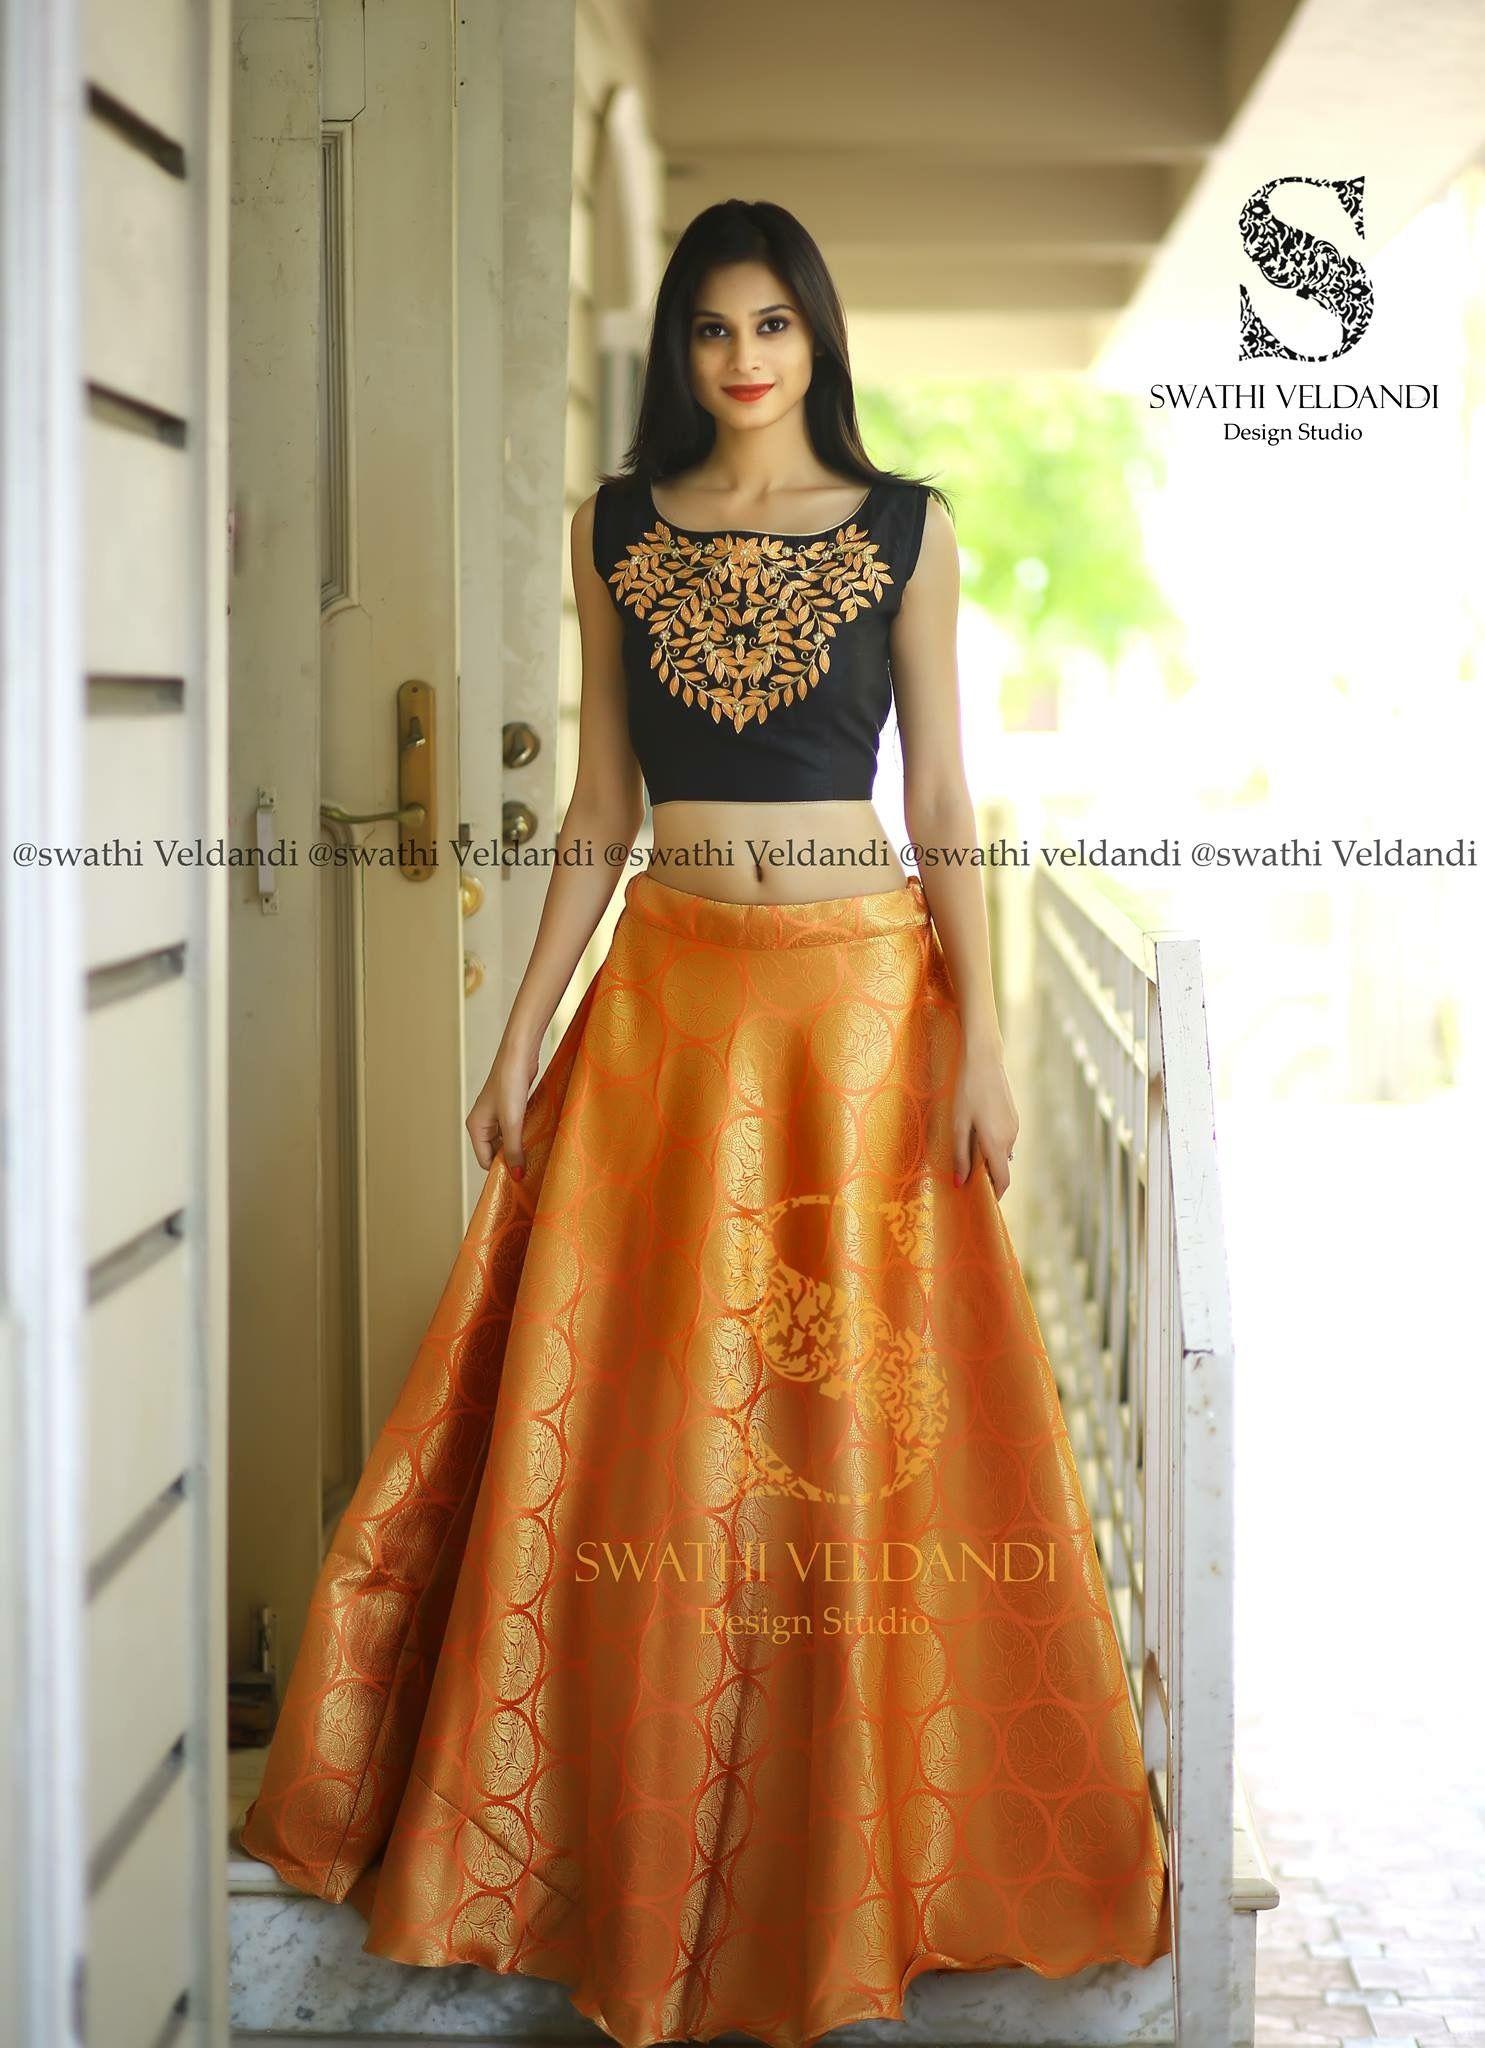 Pin de Pranathi Reddy en Fashion lehengas   Pinterest   Vestido de ...